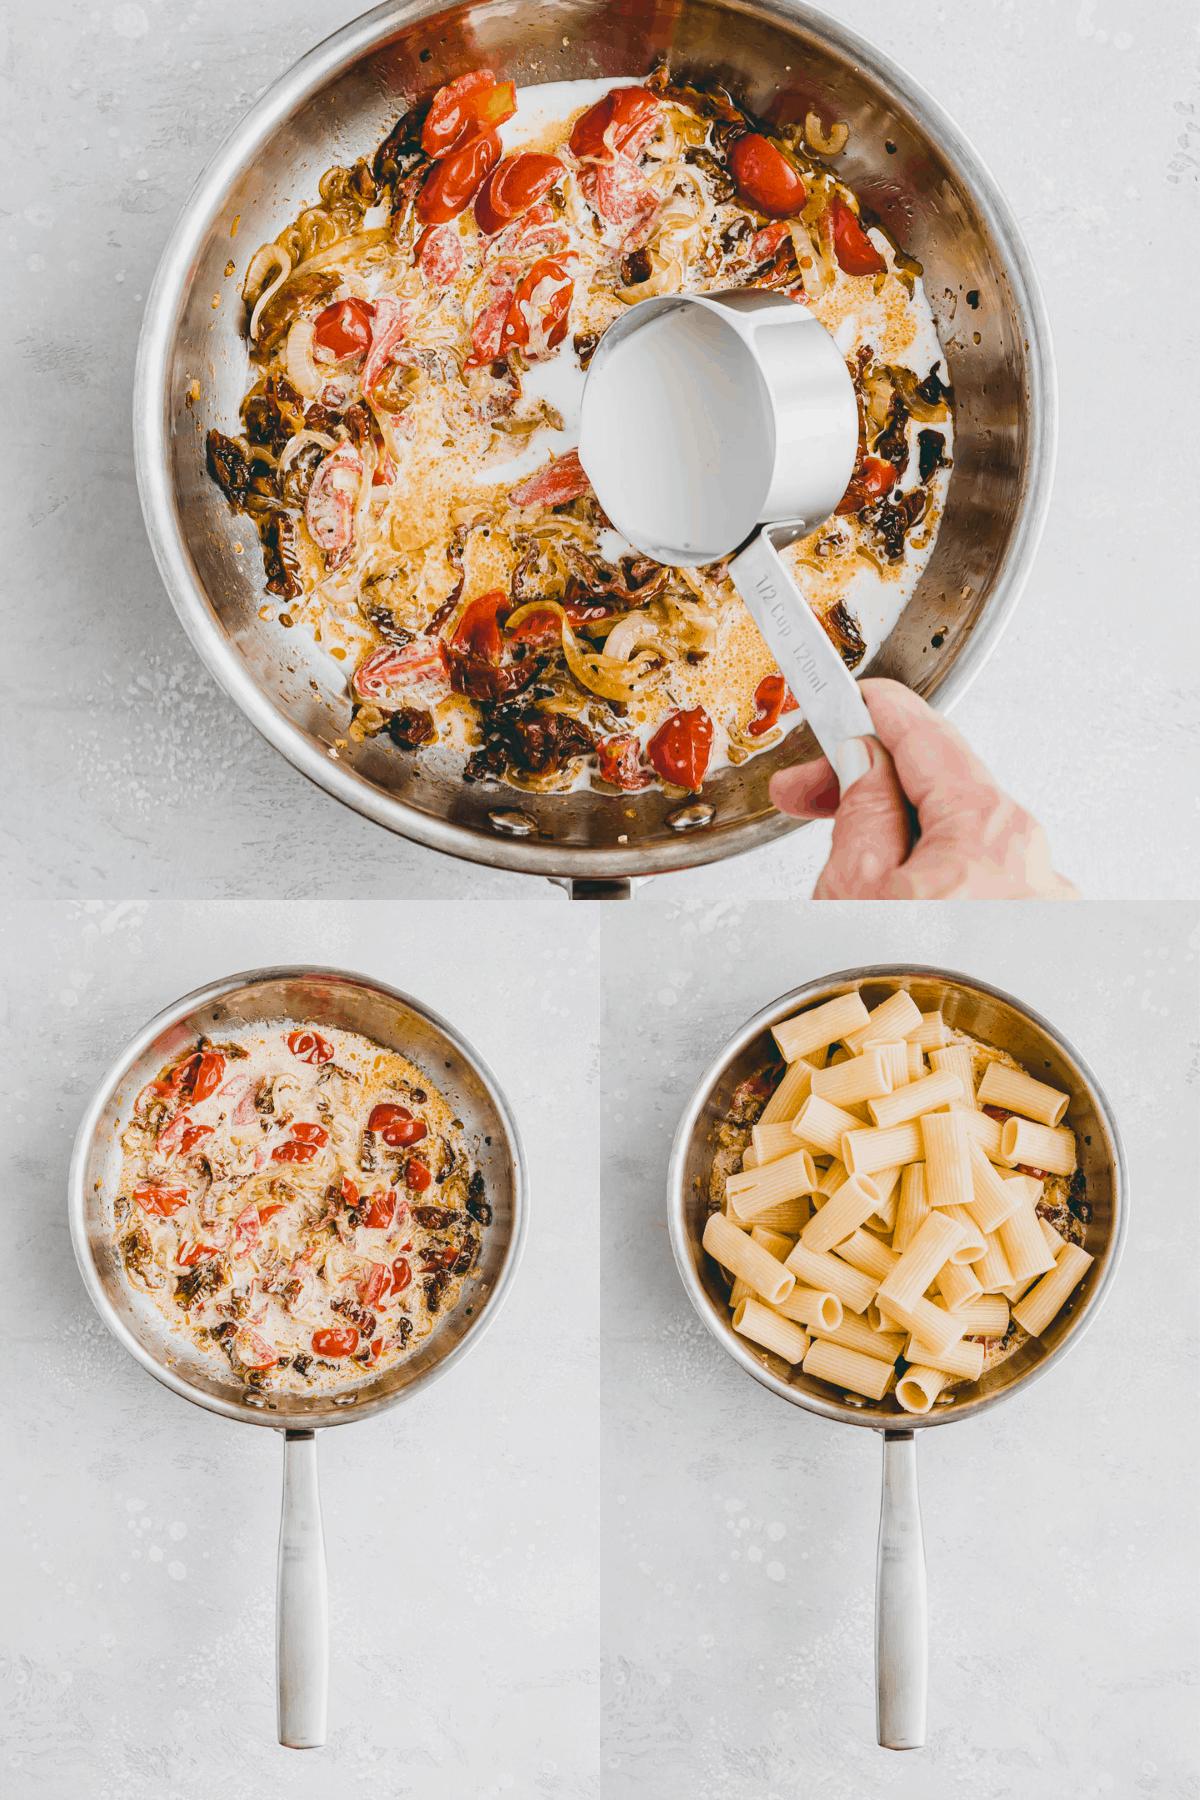 Nudeln mit getrockneten Tomaten Rezept Schritt-4-6